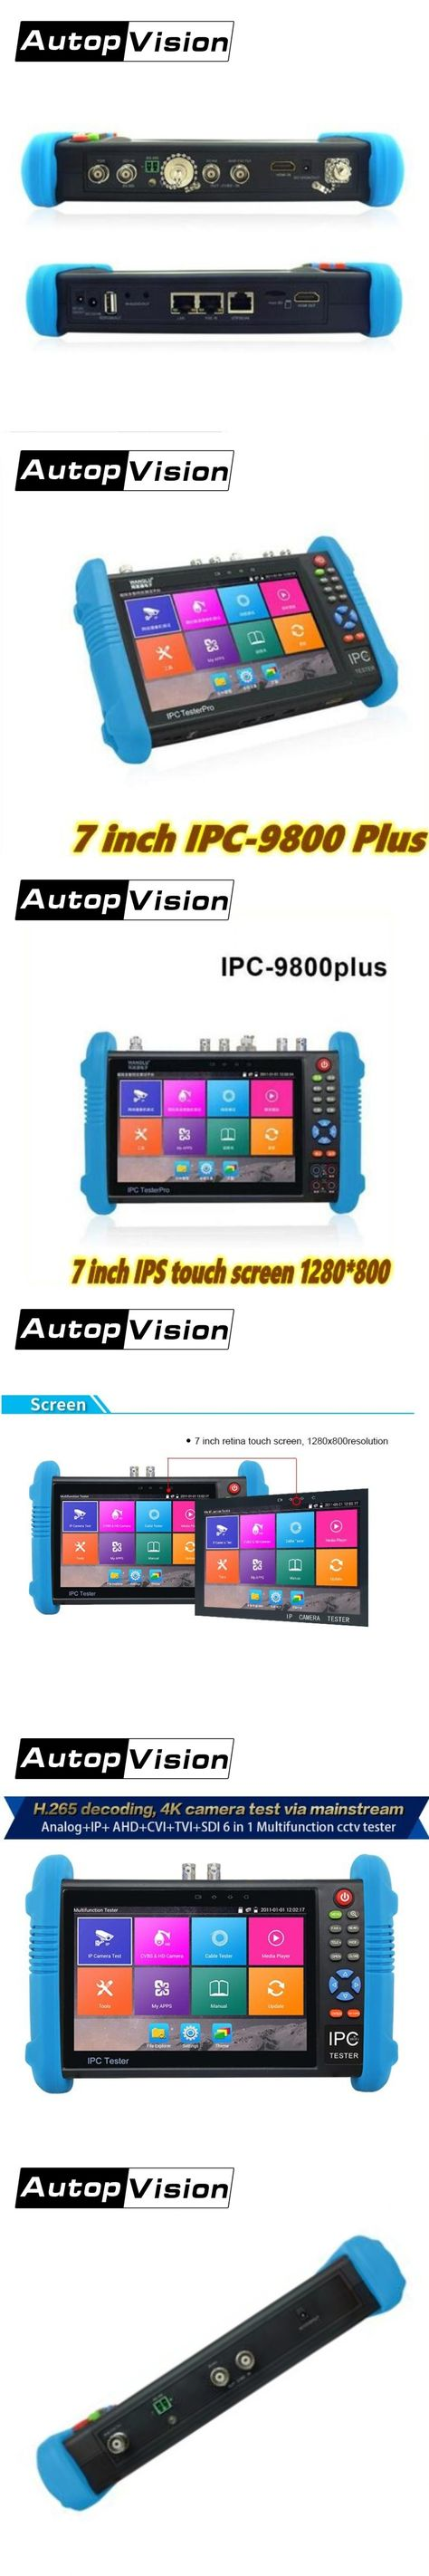 S Hdmi Tester Pictures Images On Ip Camera 7 Inch 9800 Plus 4k H265 H264 Cctv Analog Ahd Cvi Tvi Sdi